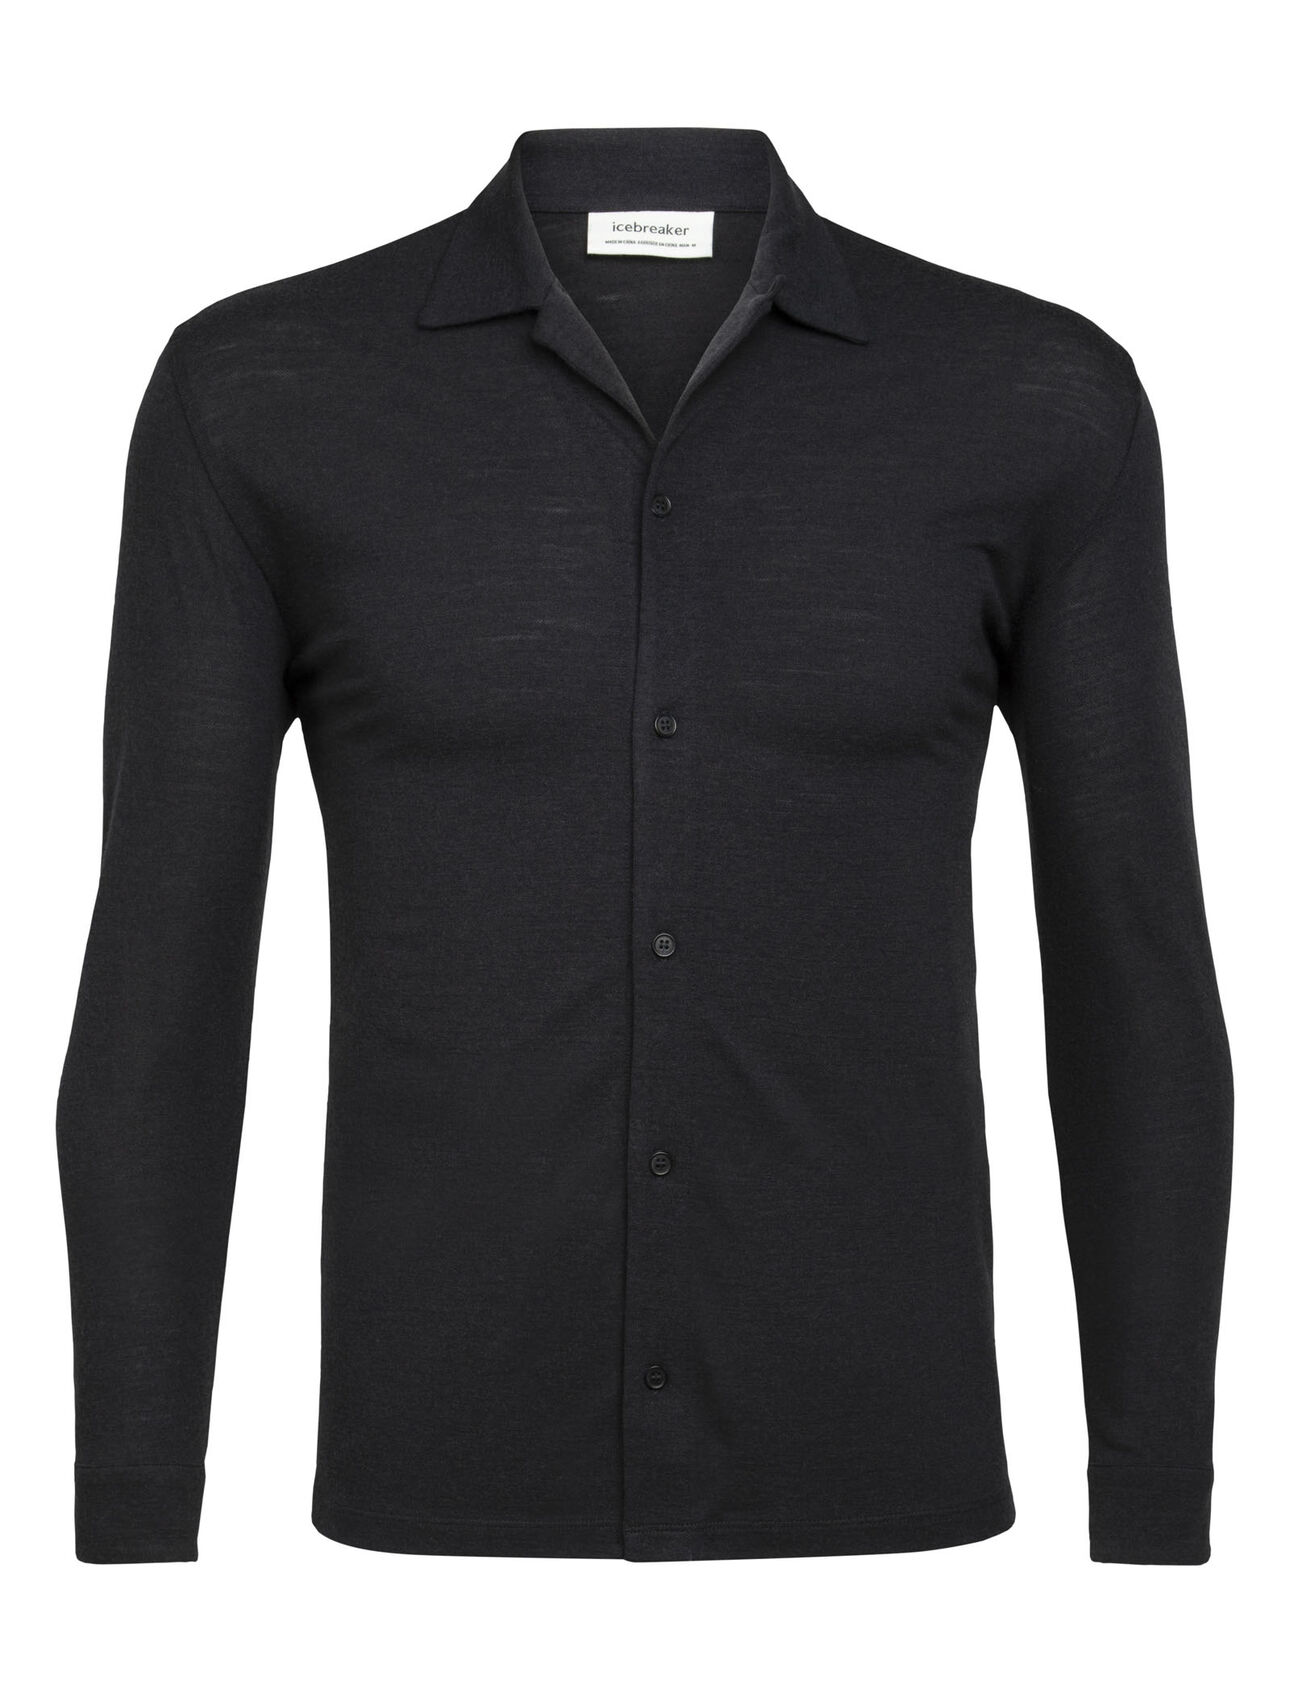 Merino Pique Long Sleeve Shirt